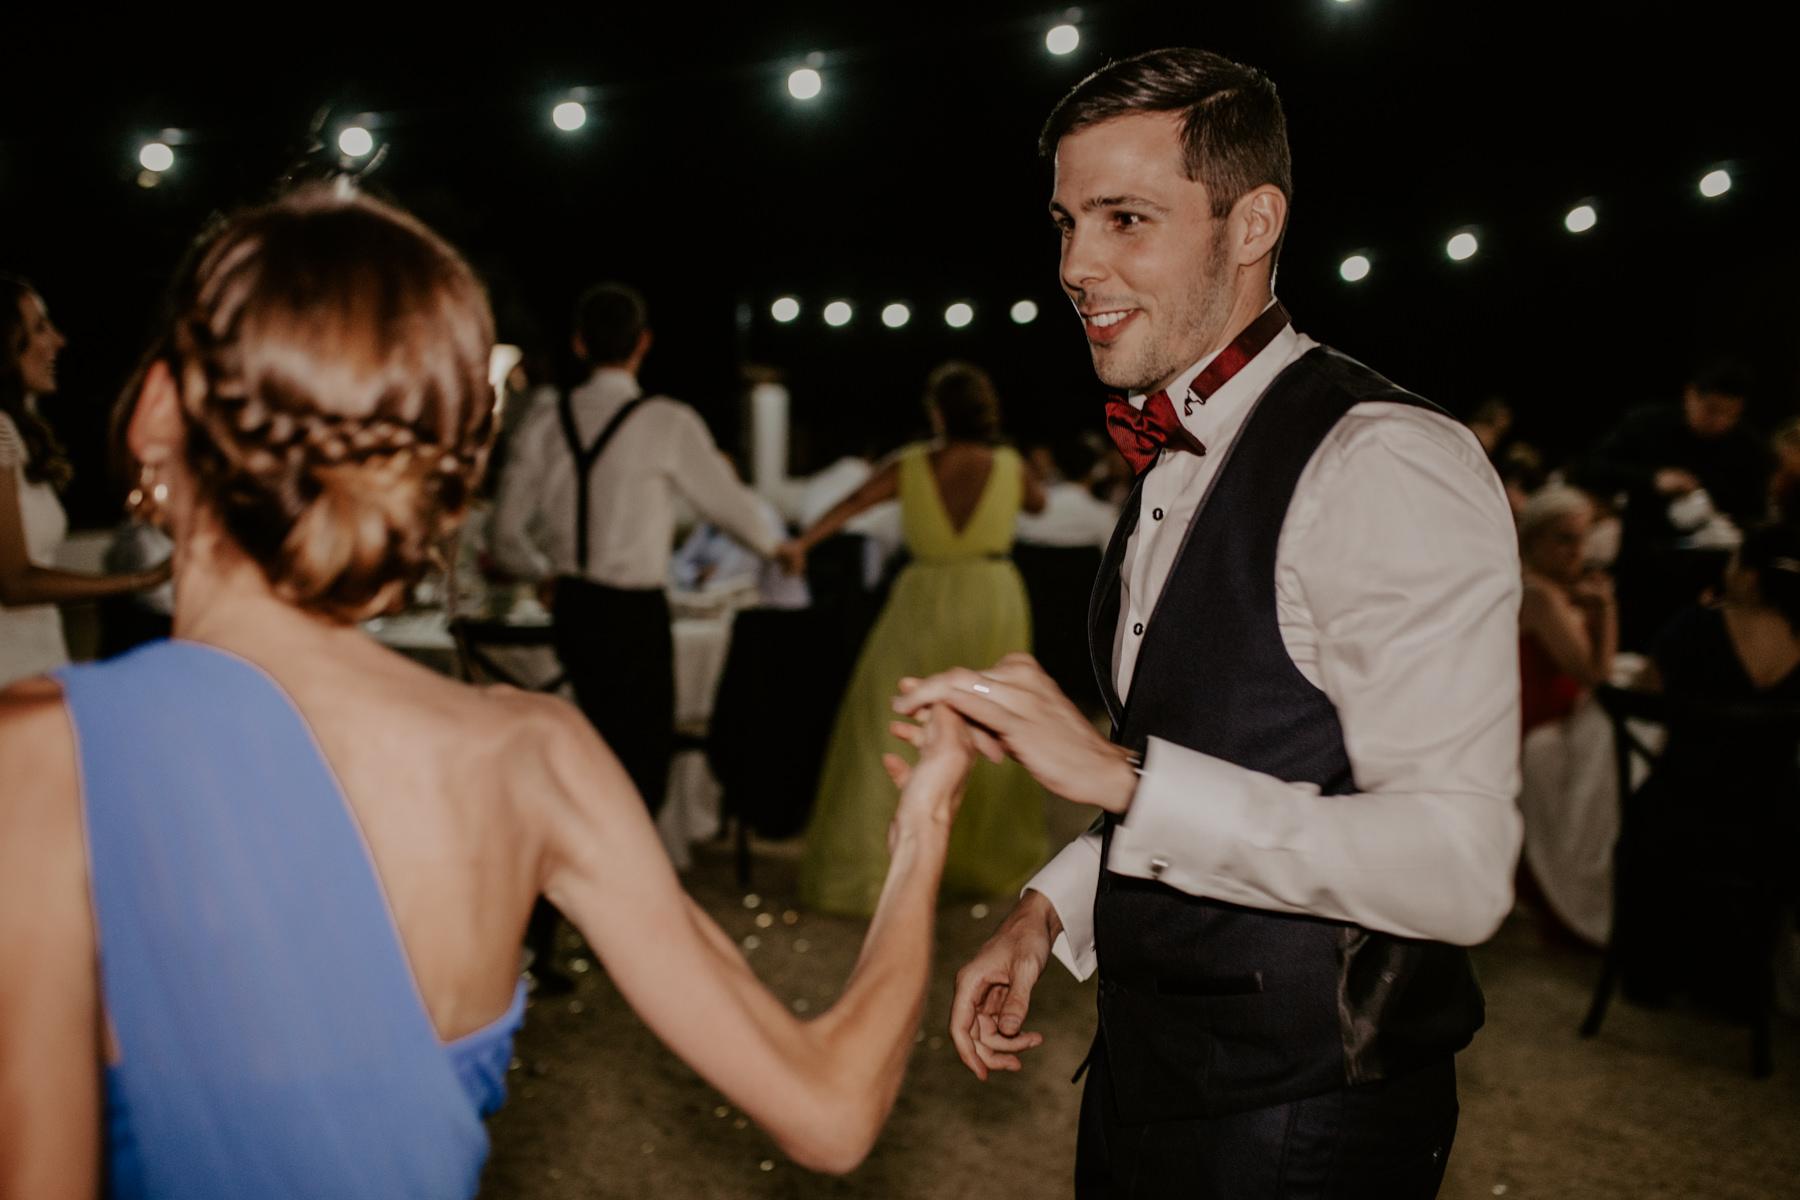 alt_thenortherngirlphotography_couples_weddingphotographer_photographer_wedding_boda_fotografodebodas_fotografobodasbarcelona_bodaindie_bodasconestilo_bodaensantperedeclara_jennifermiguel-867.jpg